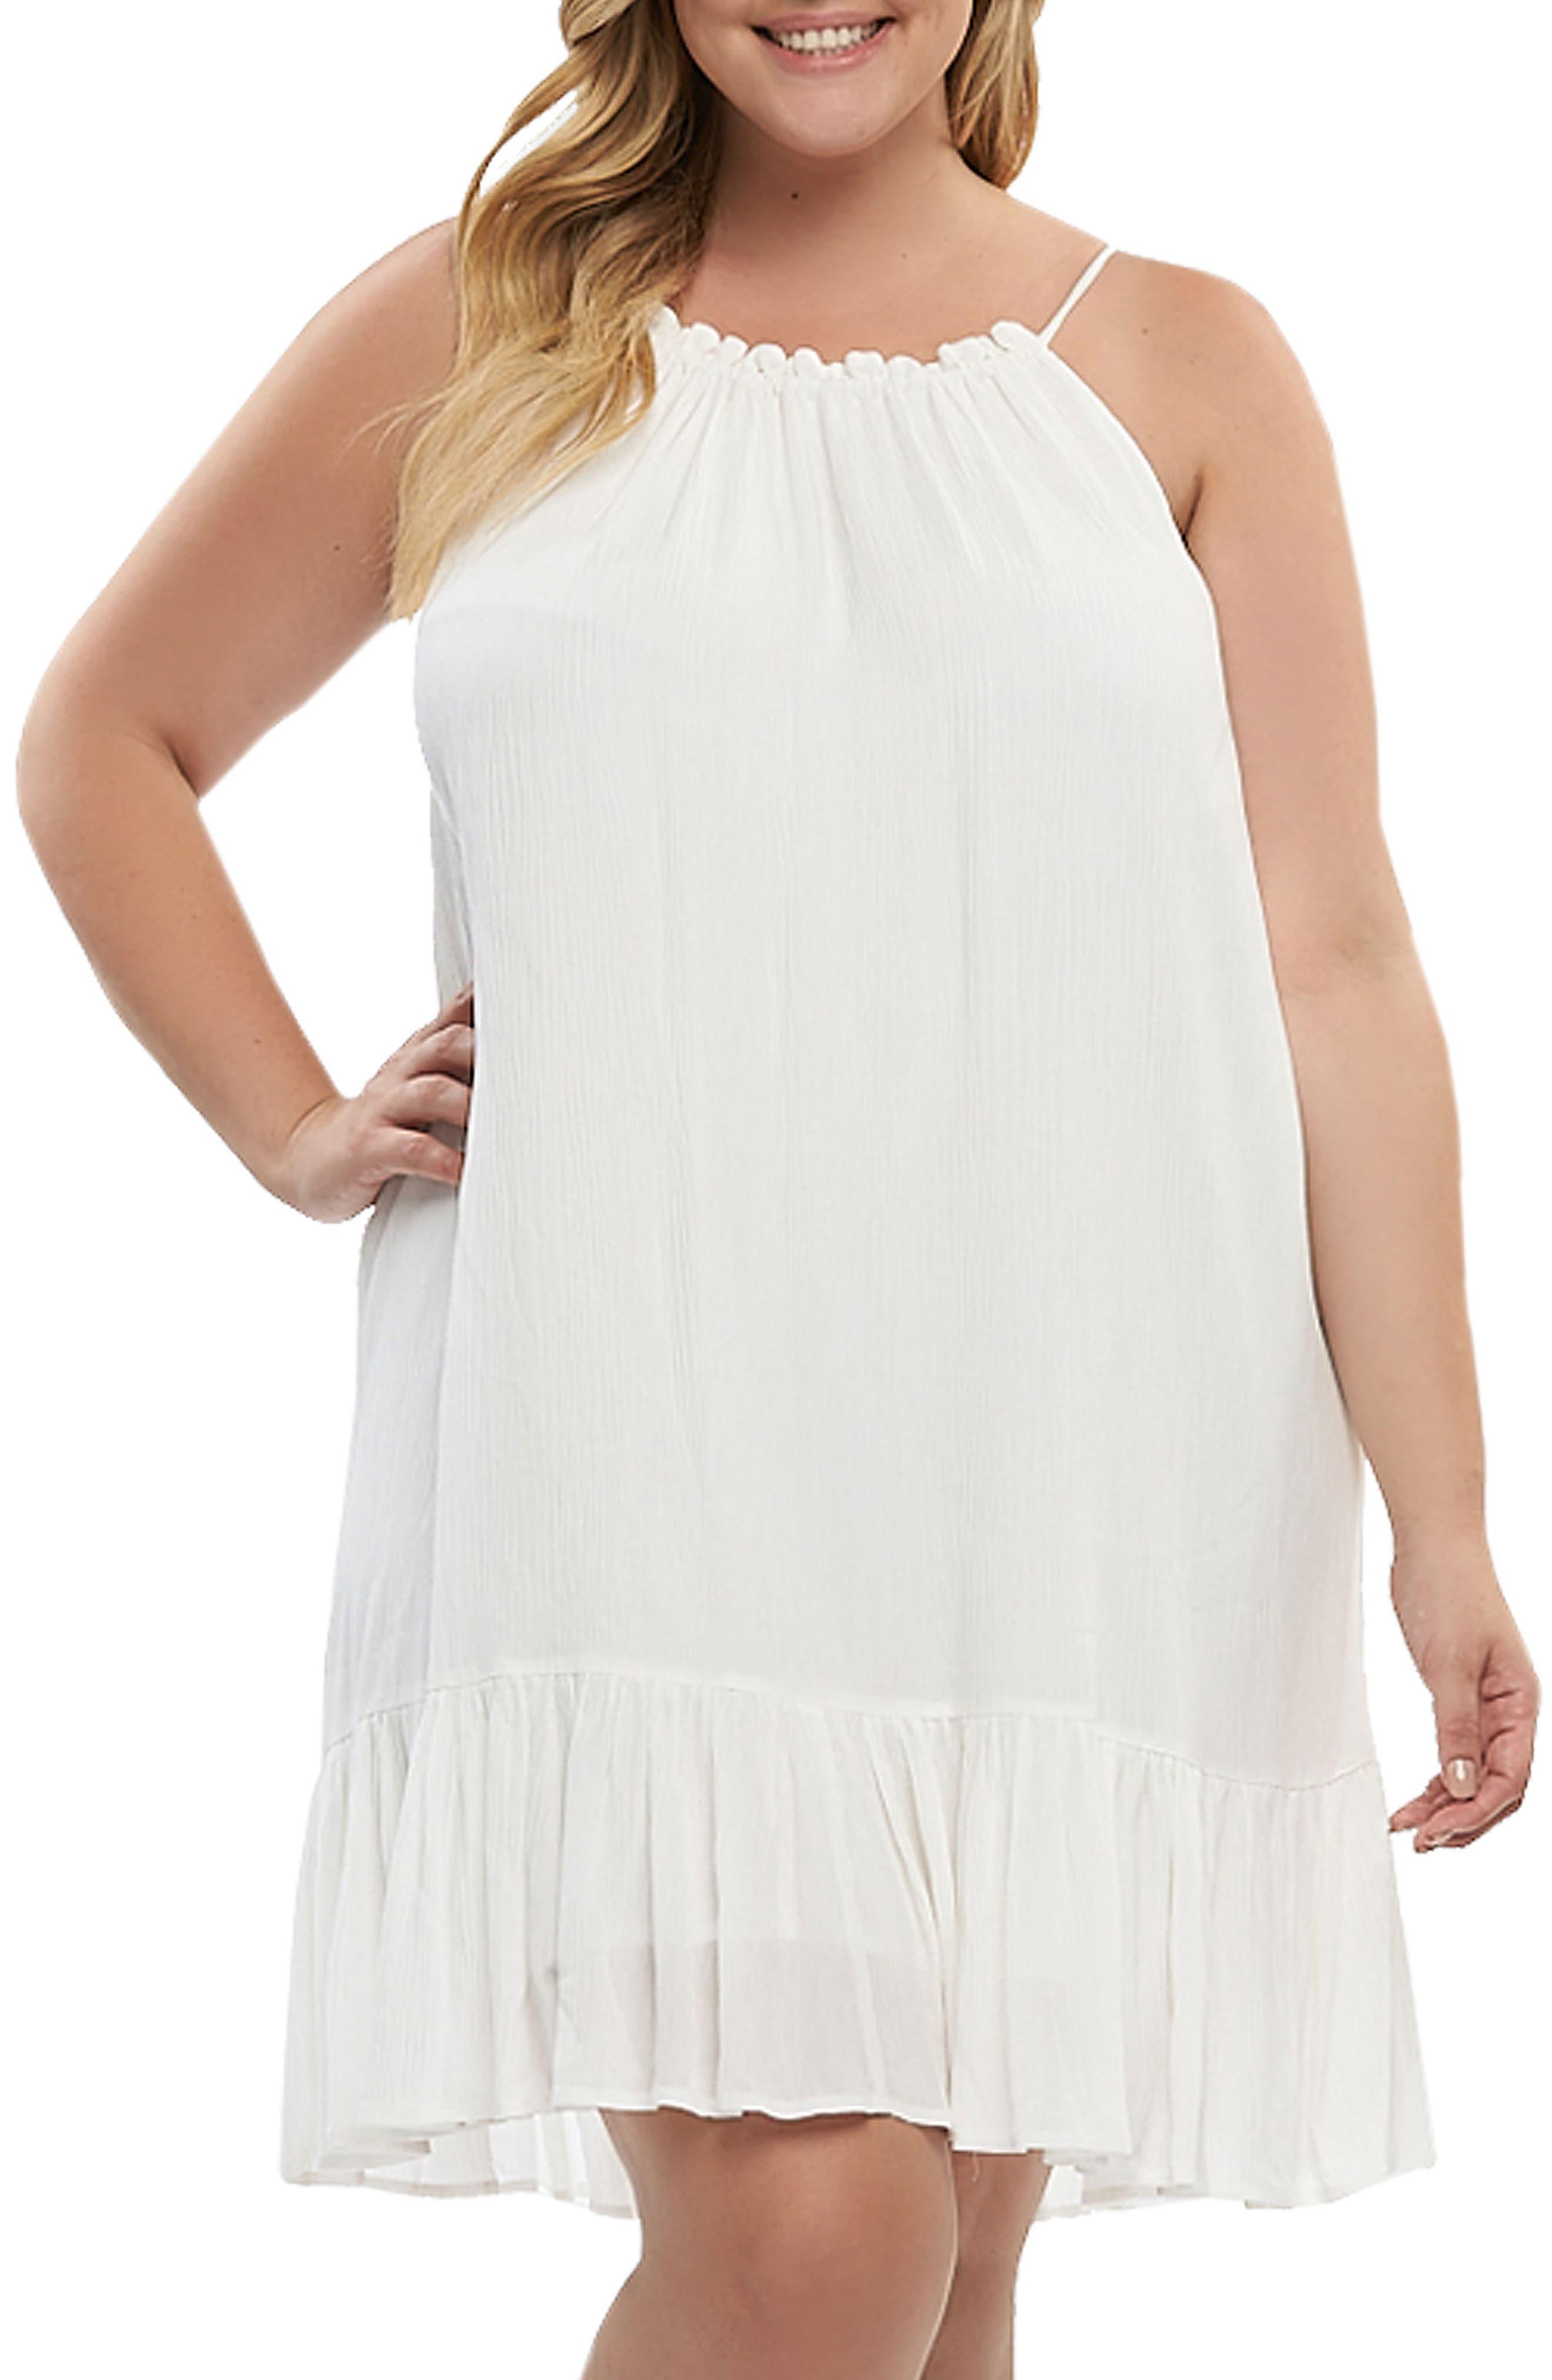 Liz Halter Top Baby Doll Dress,                             Main thumbnail 1, color,                             White